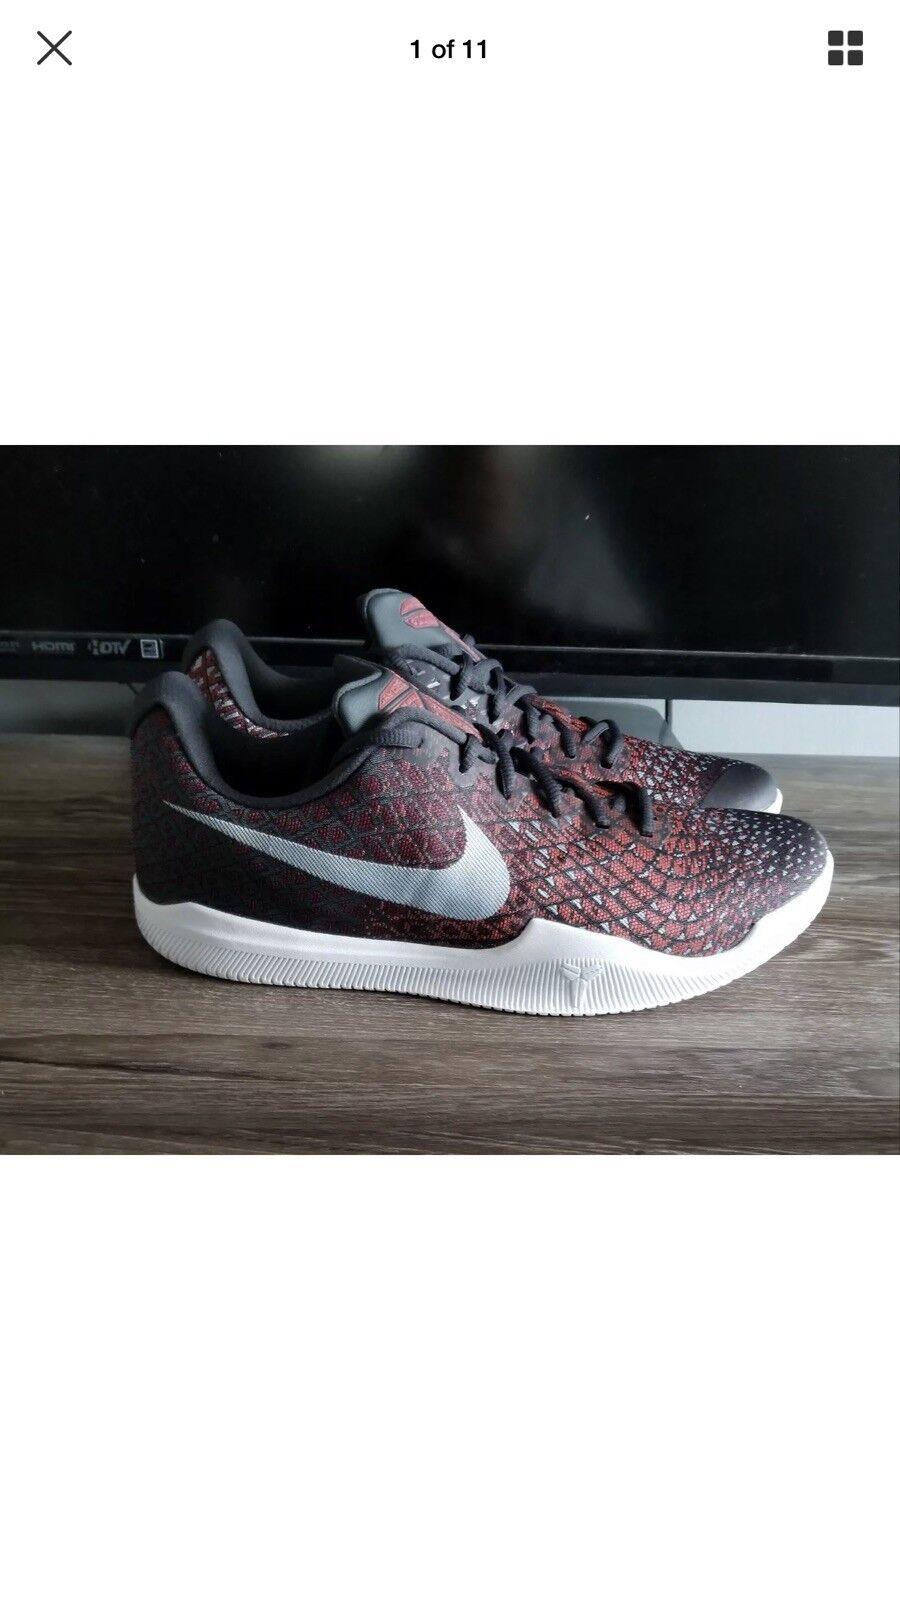 Nike Kobe Bryant Mamba Instinct Low Black Grey Red 852473-006 Mens Size 12